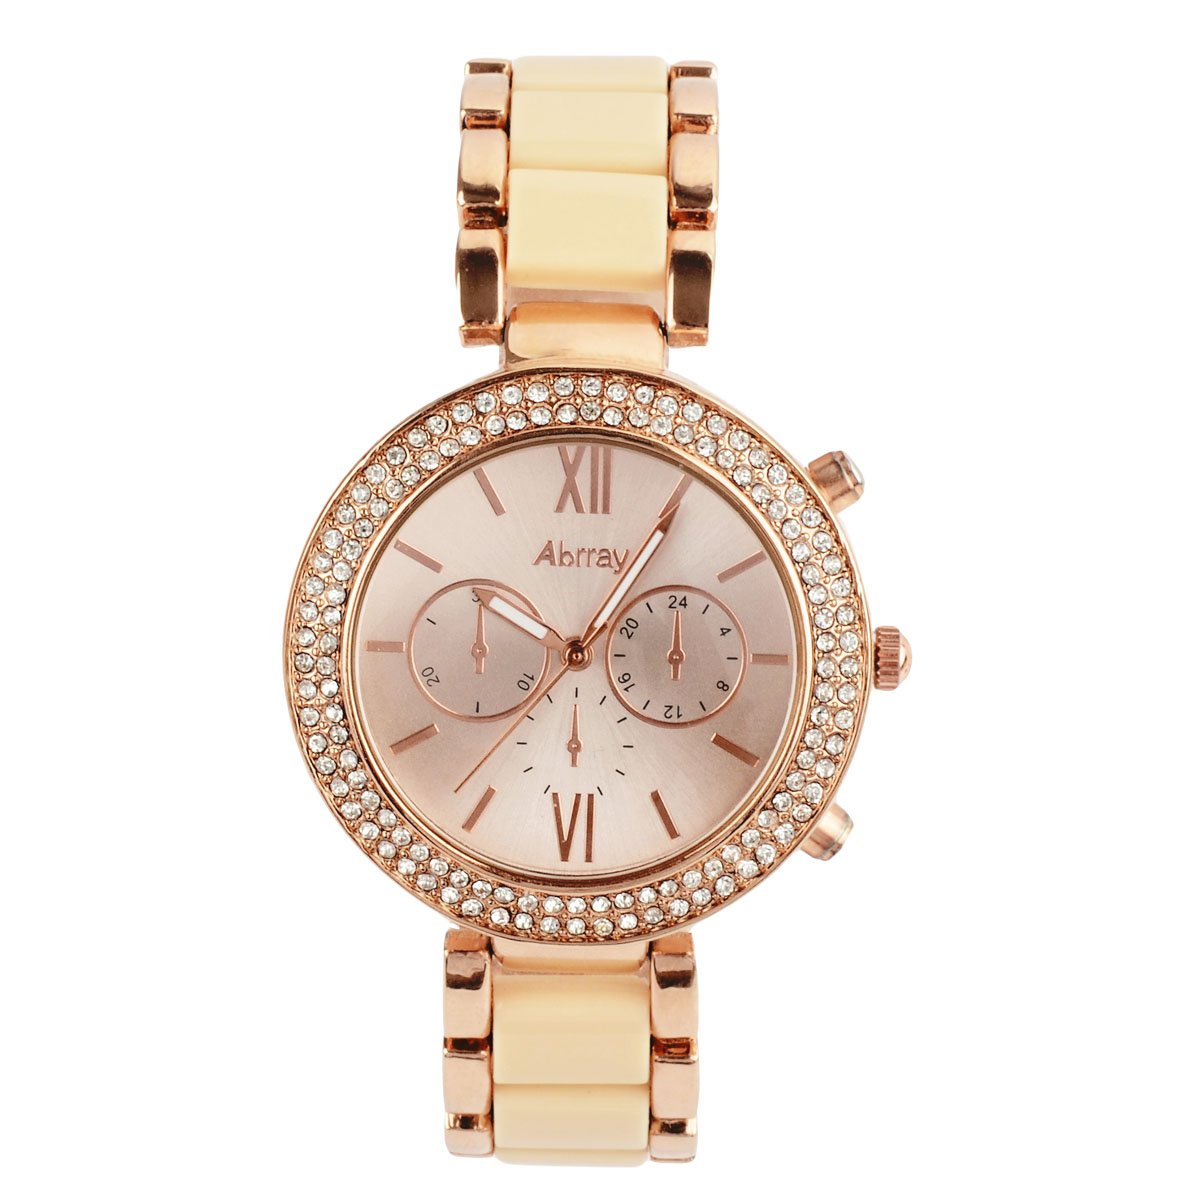 Oumosi Women\'s Swarovski Crystal Accented Gold-Tone and Pink Bracelet Wrist Watch